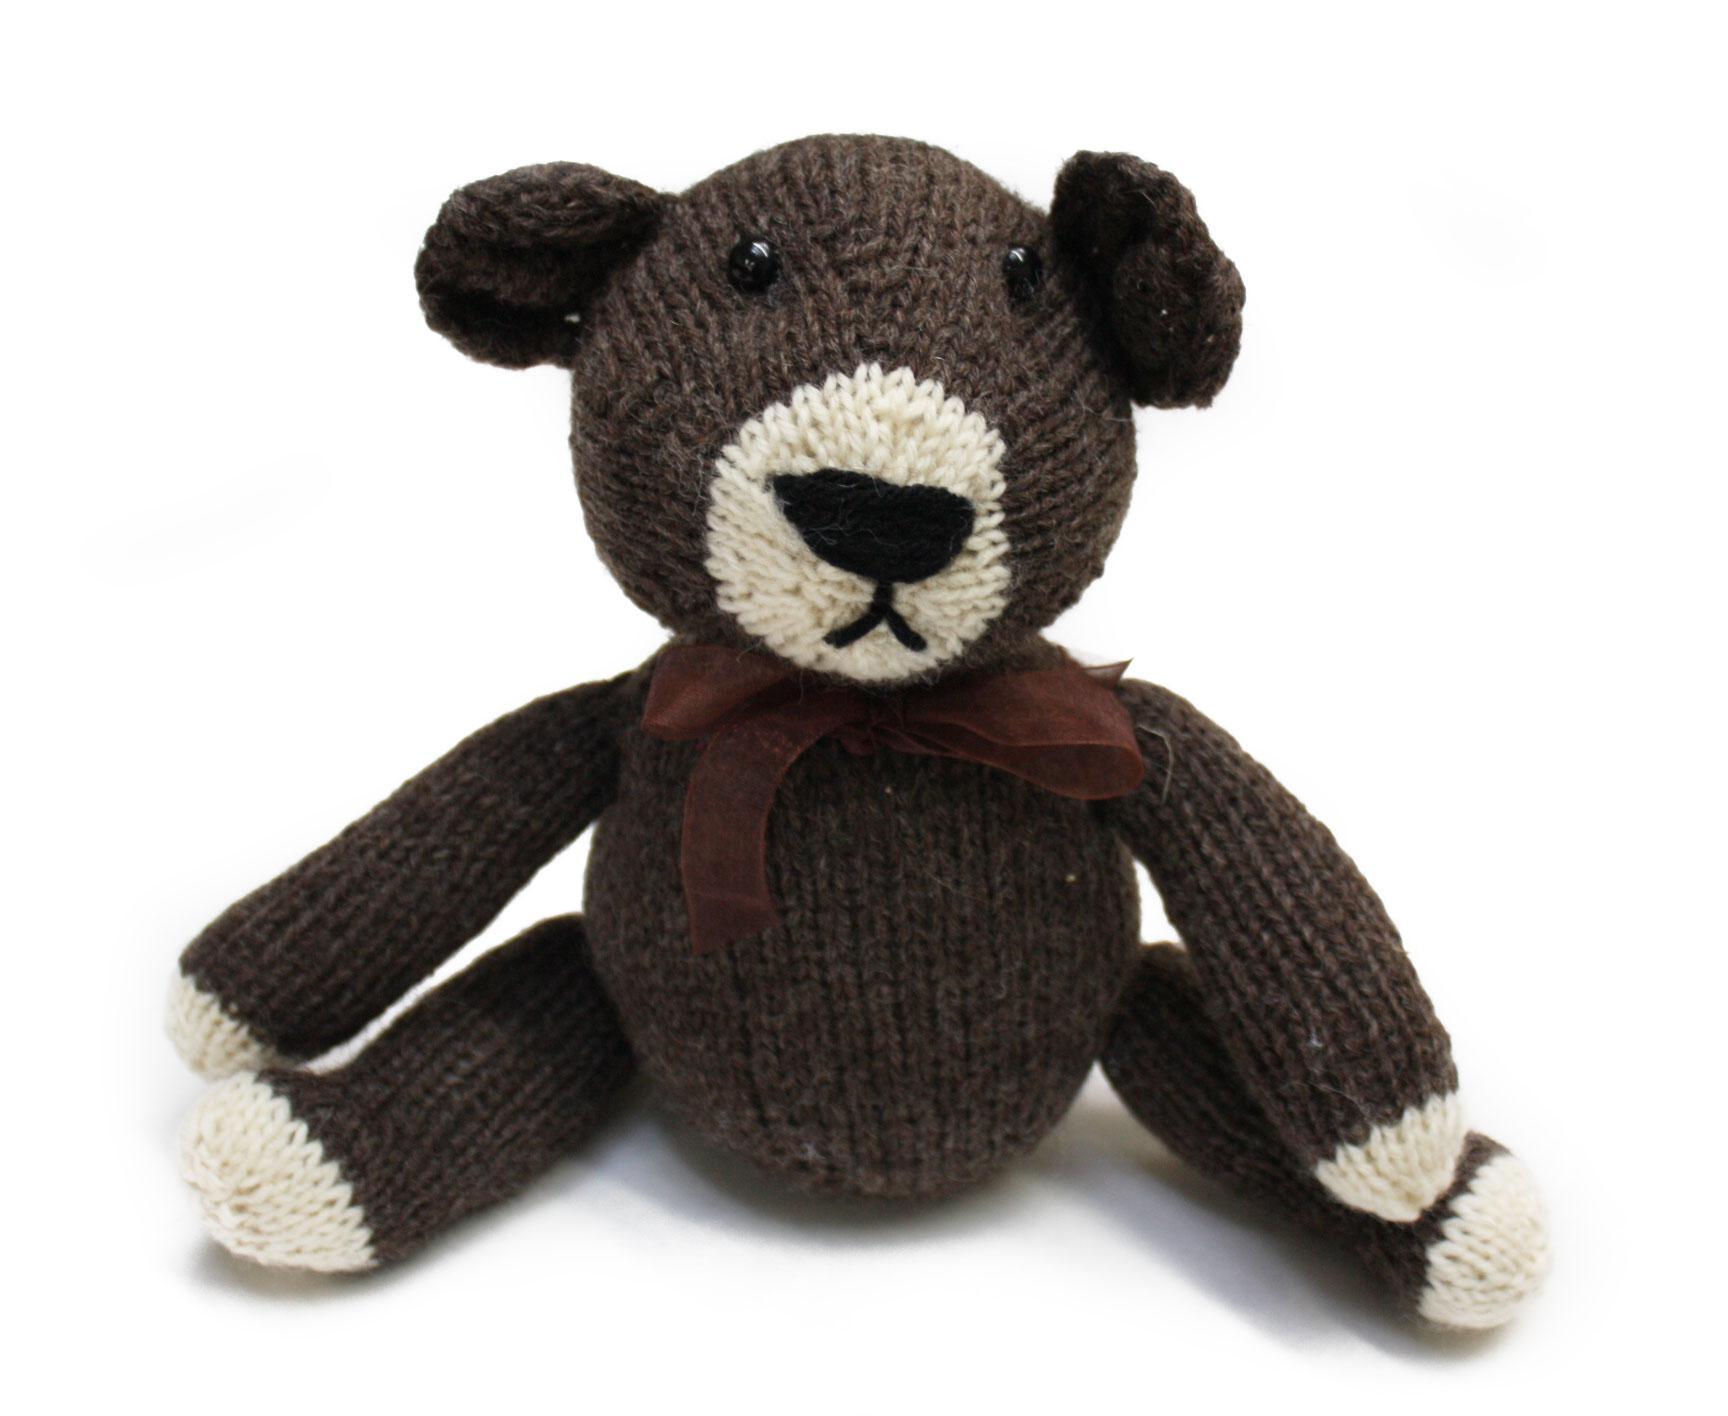 Gregory Patrick Hand Knit Bear